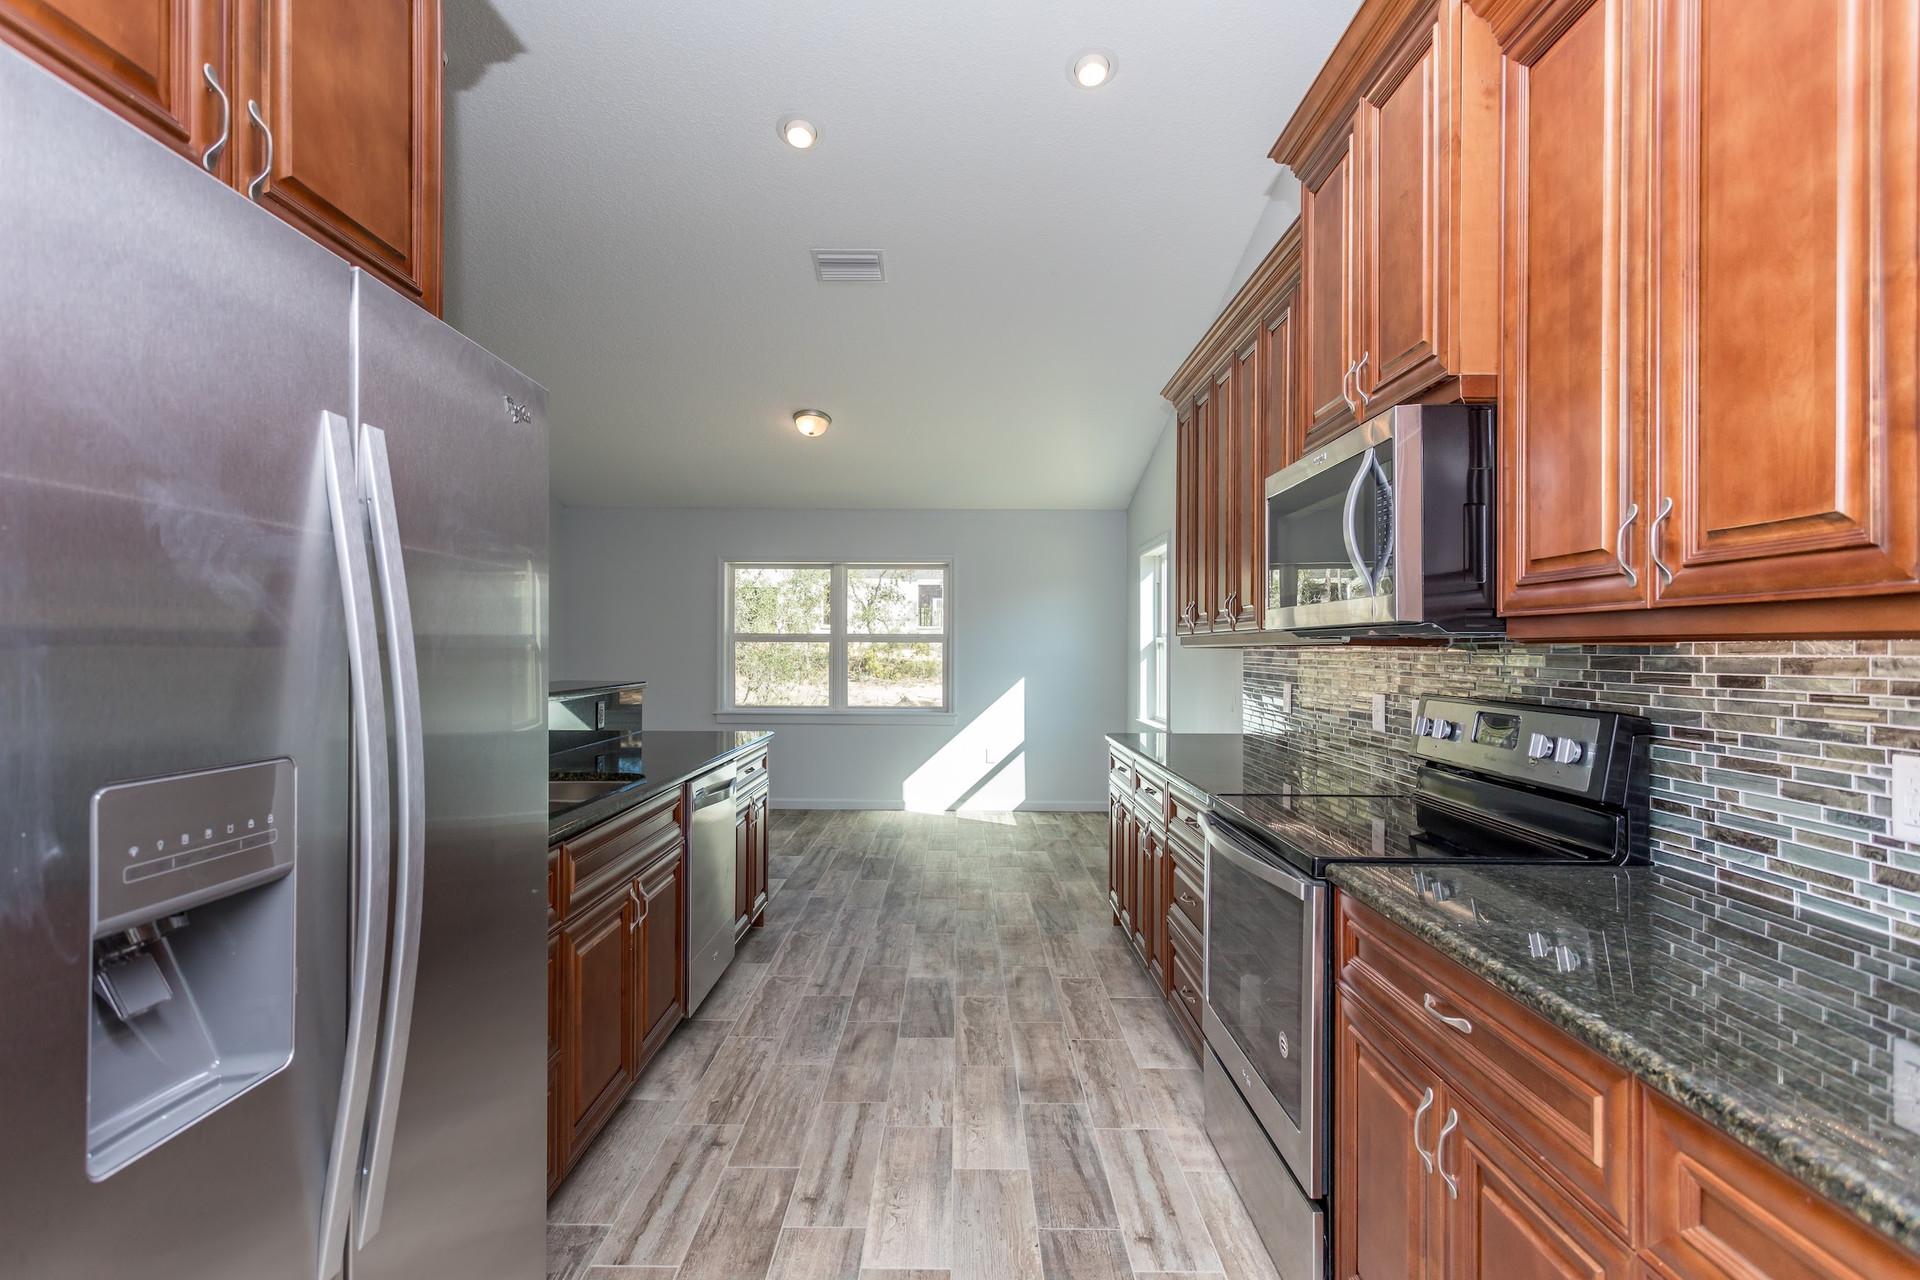 LEDGESTONE kitchen from the laundry room